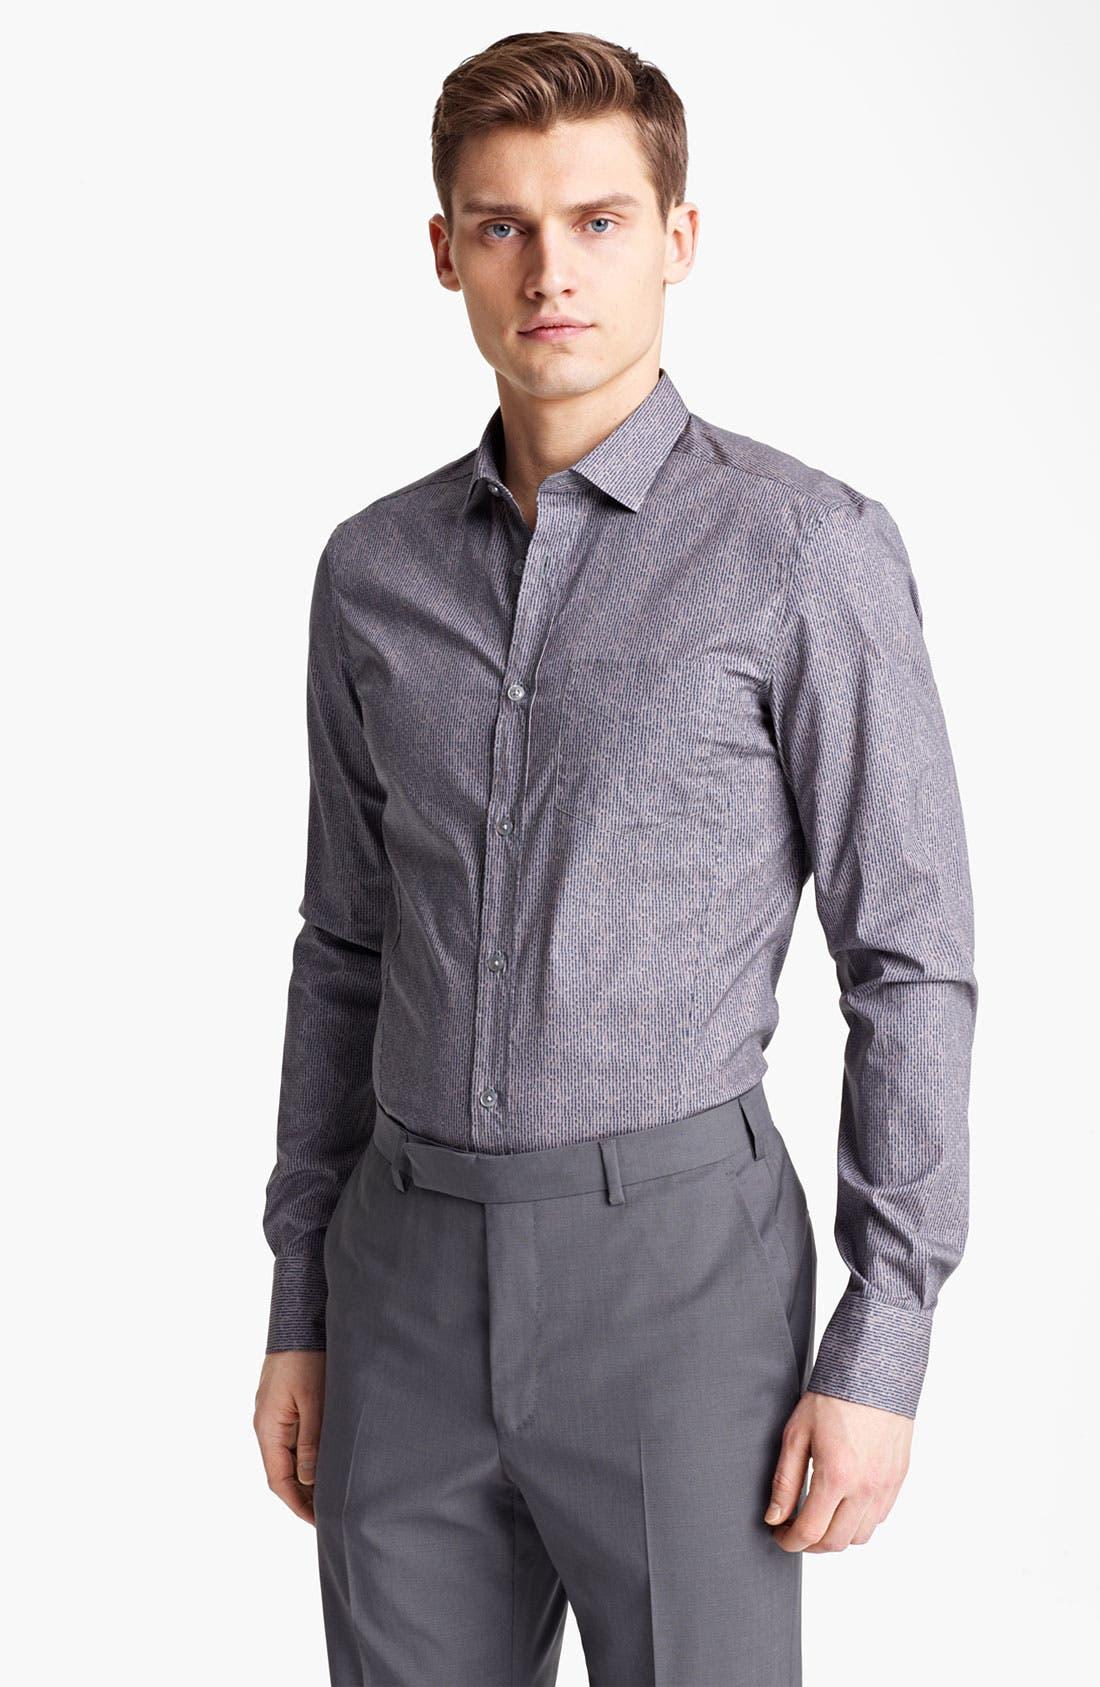 Main Image - Z Zegna Textured Print Dress Shirt